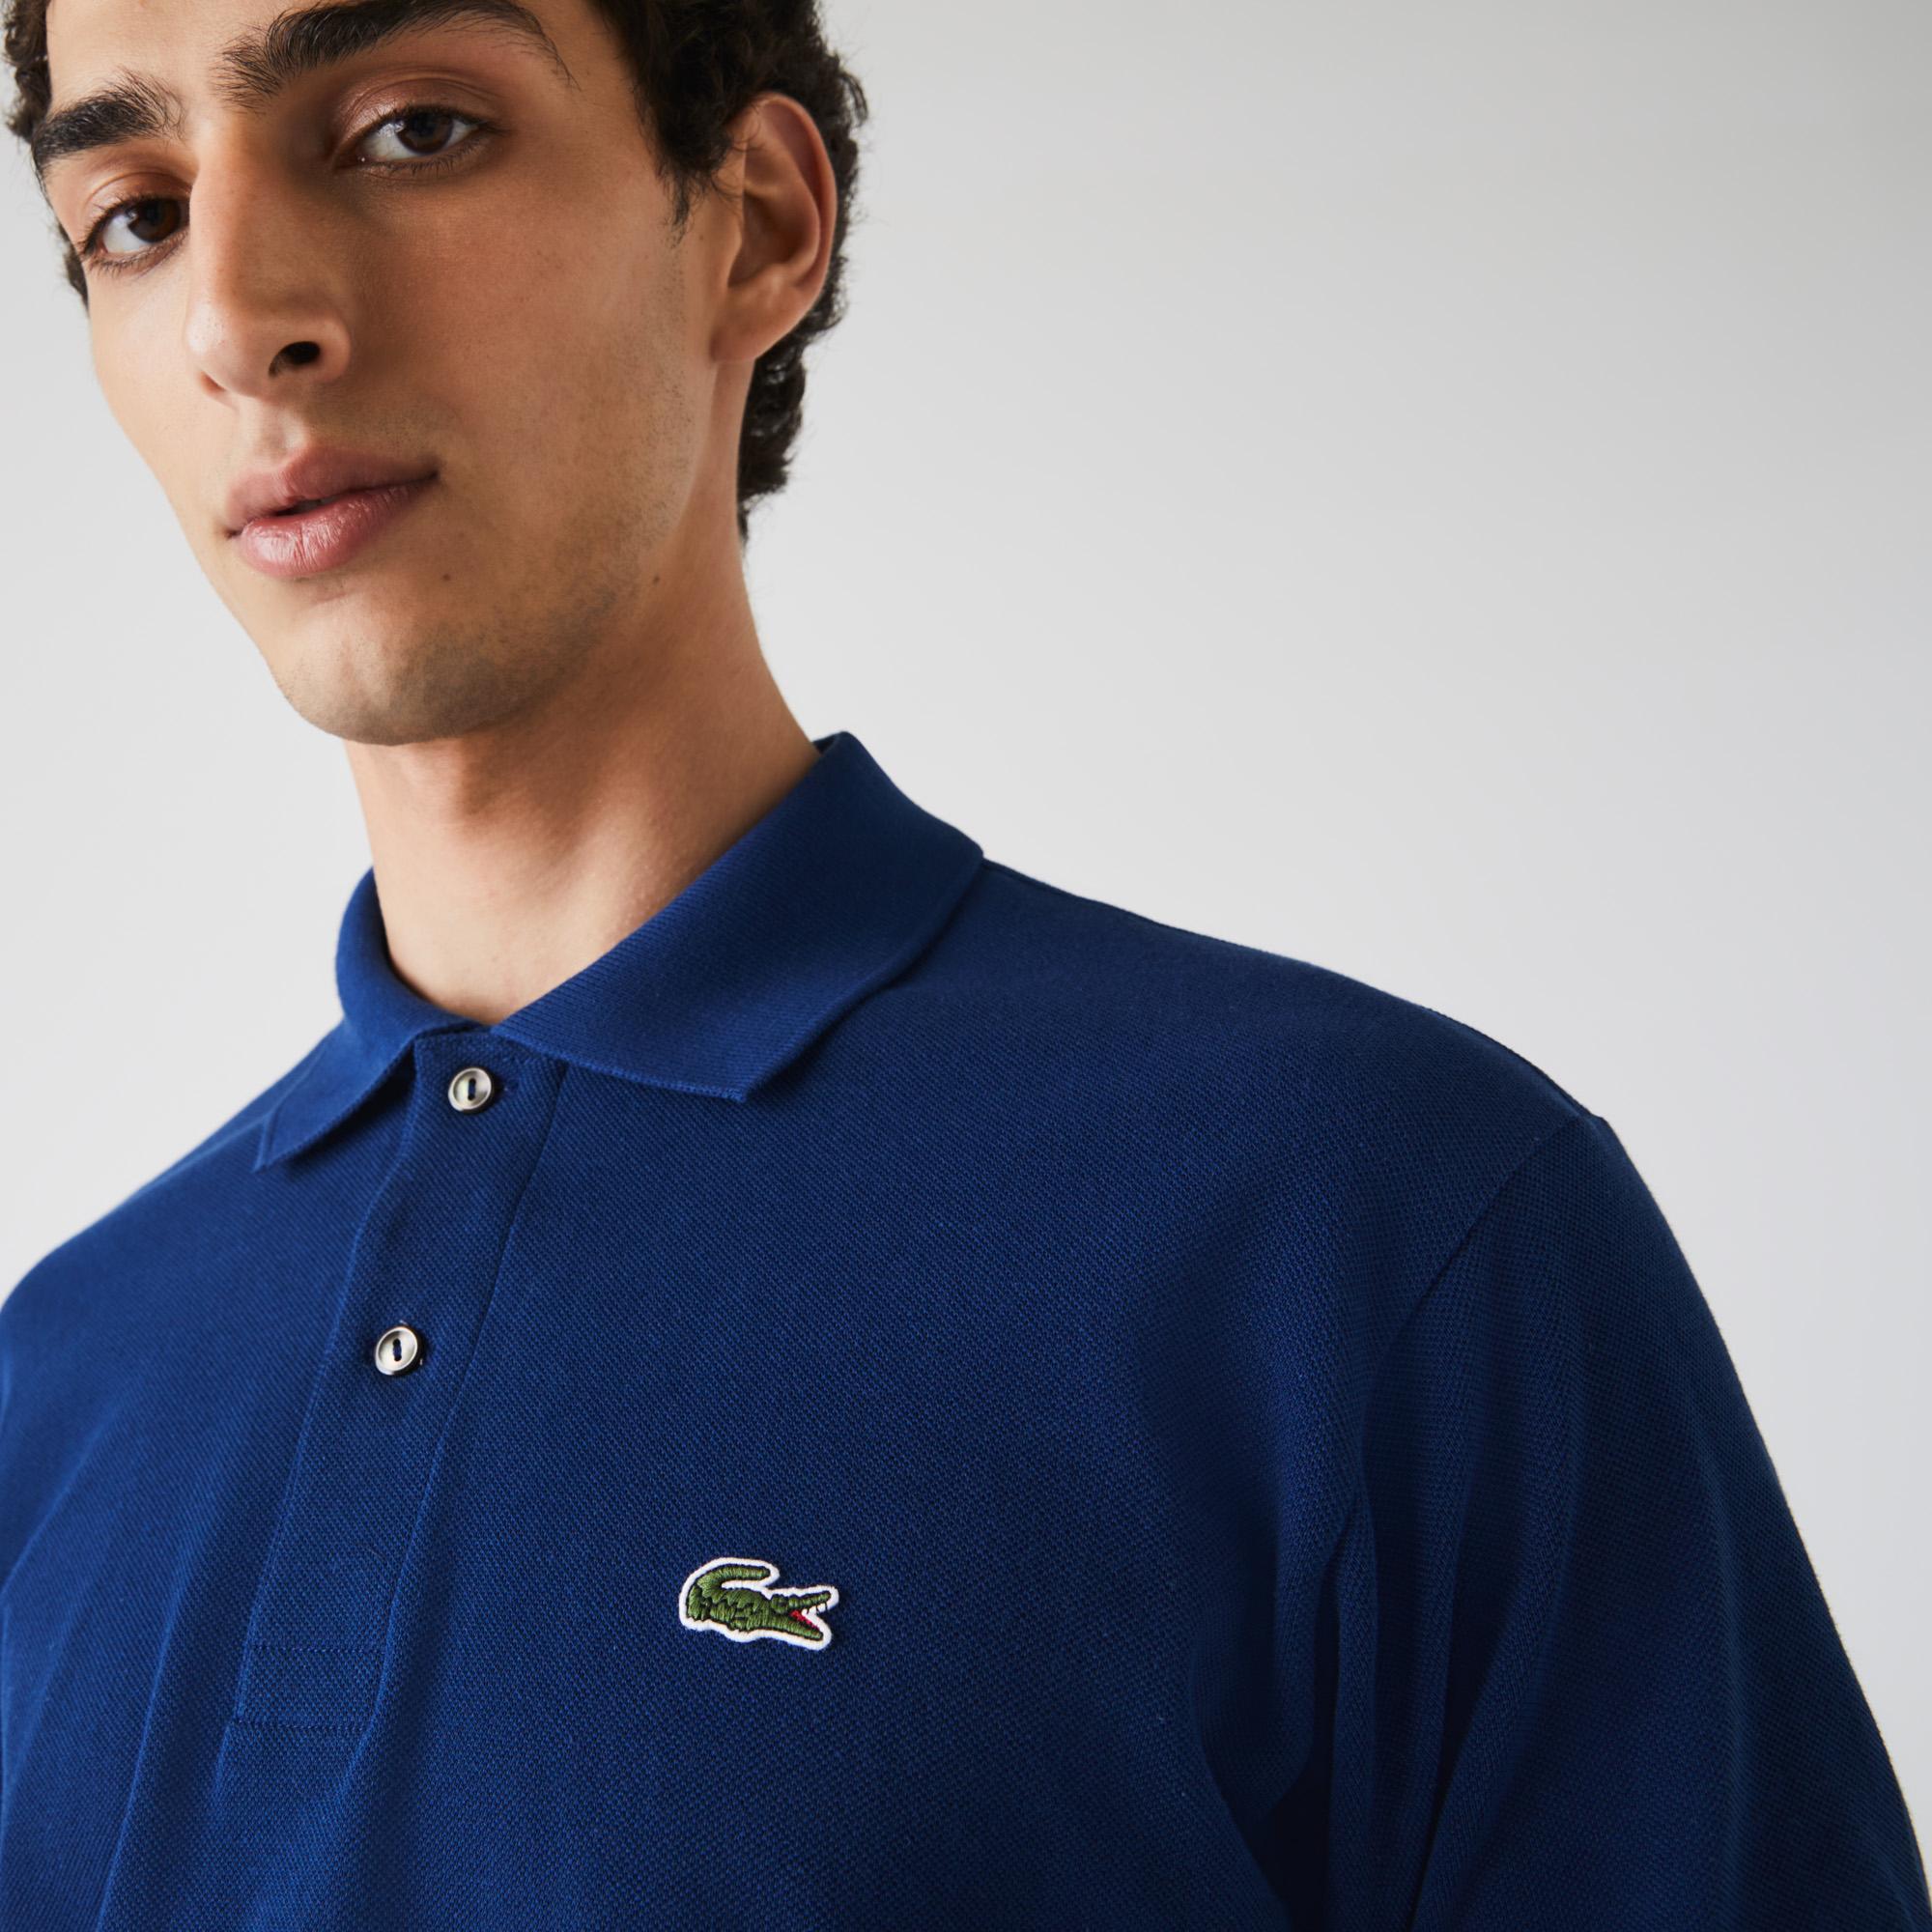 Lacoste Erkek Klasik Fit Mavi L1212 Polo